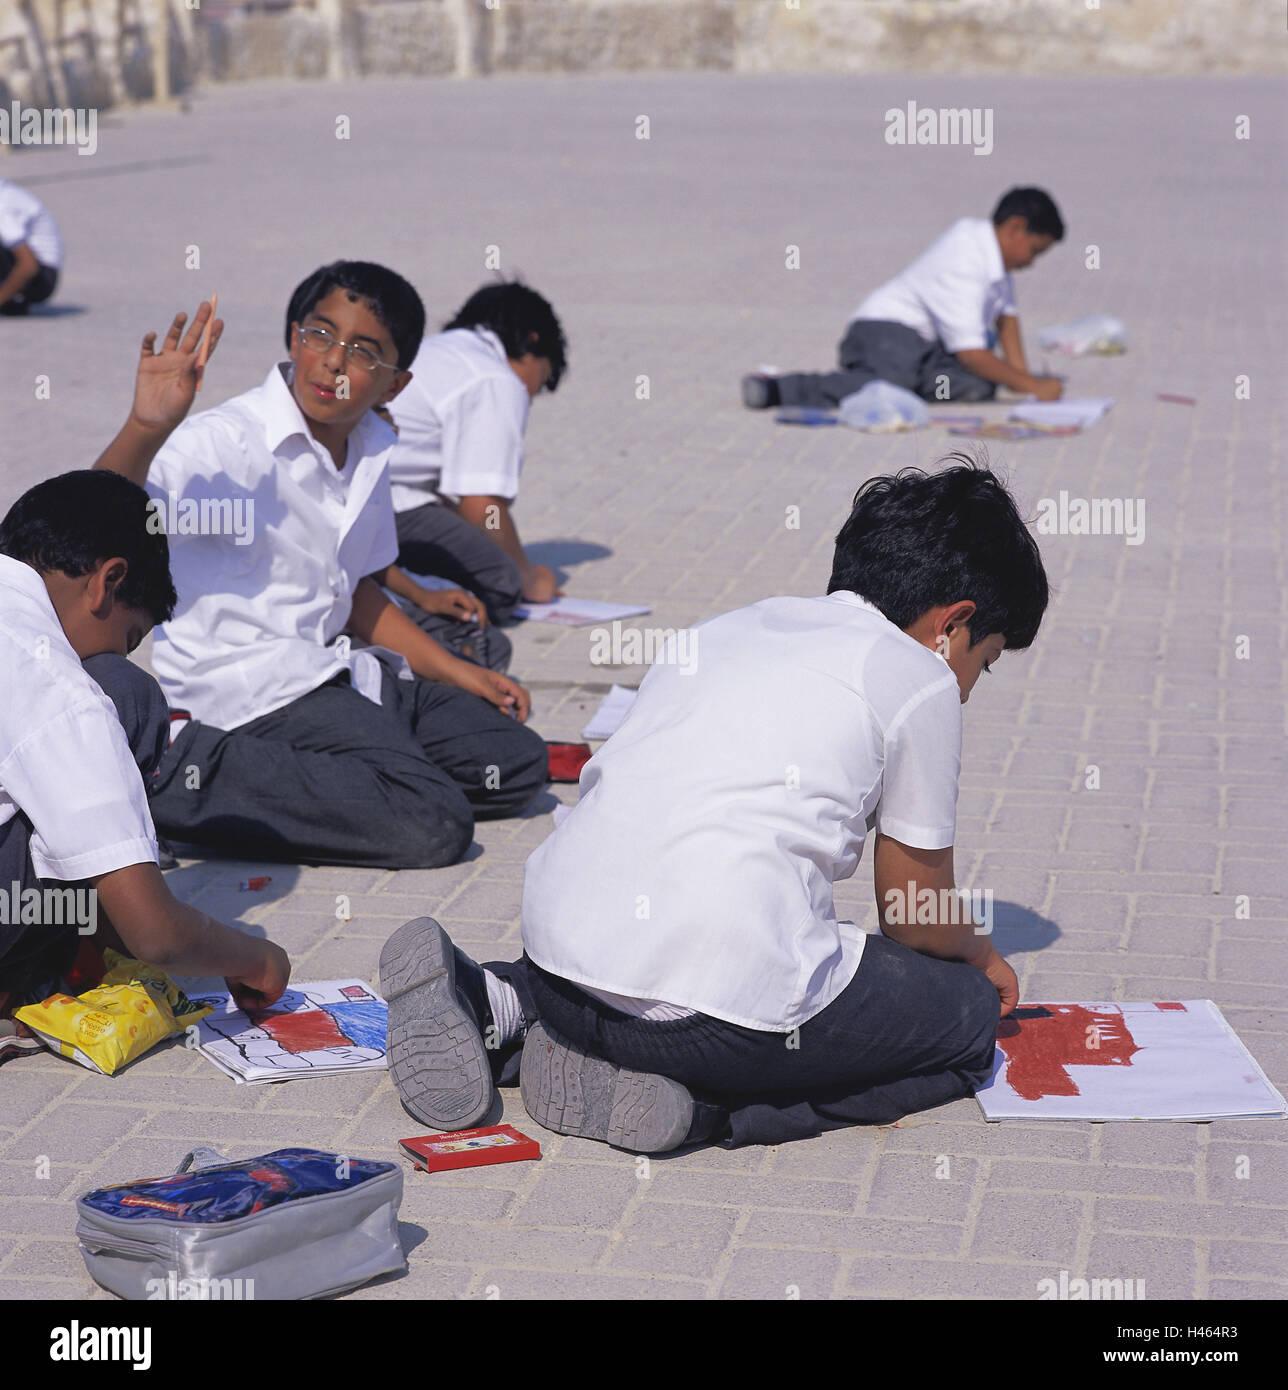 Bahrain, island Muharraq, fortress, Qala'at Arad, children, drawing, no model release, island state, sheikdom, - Stock Image